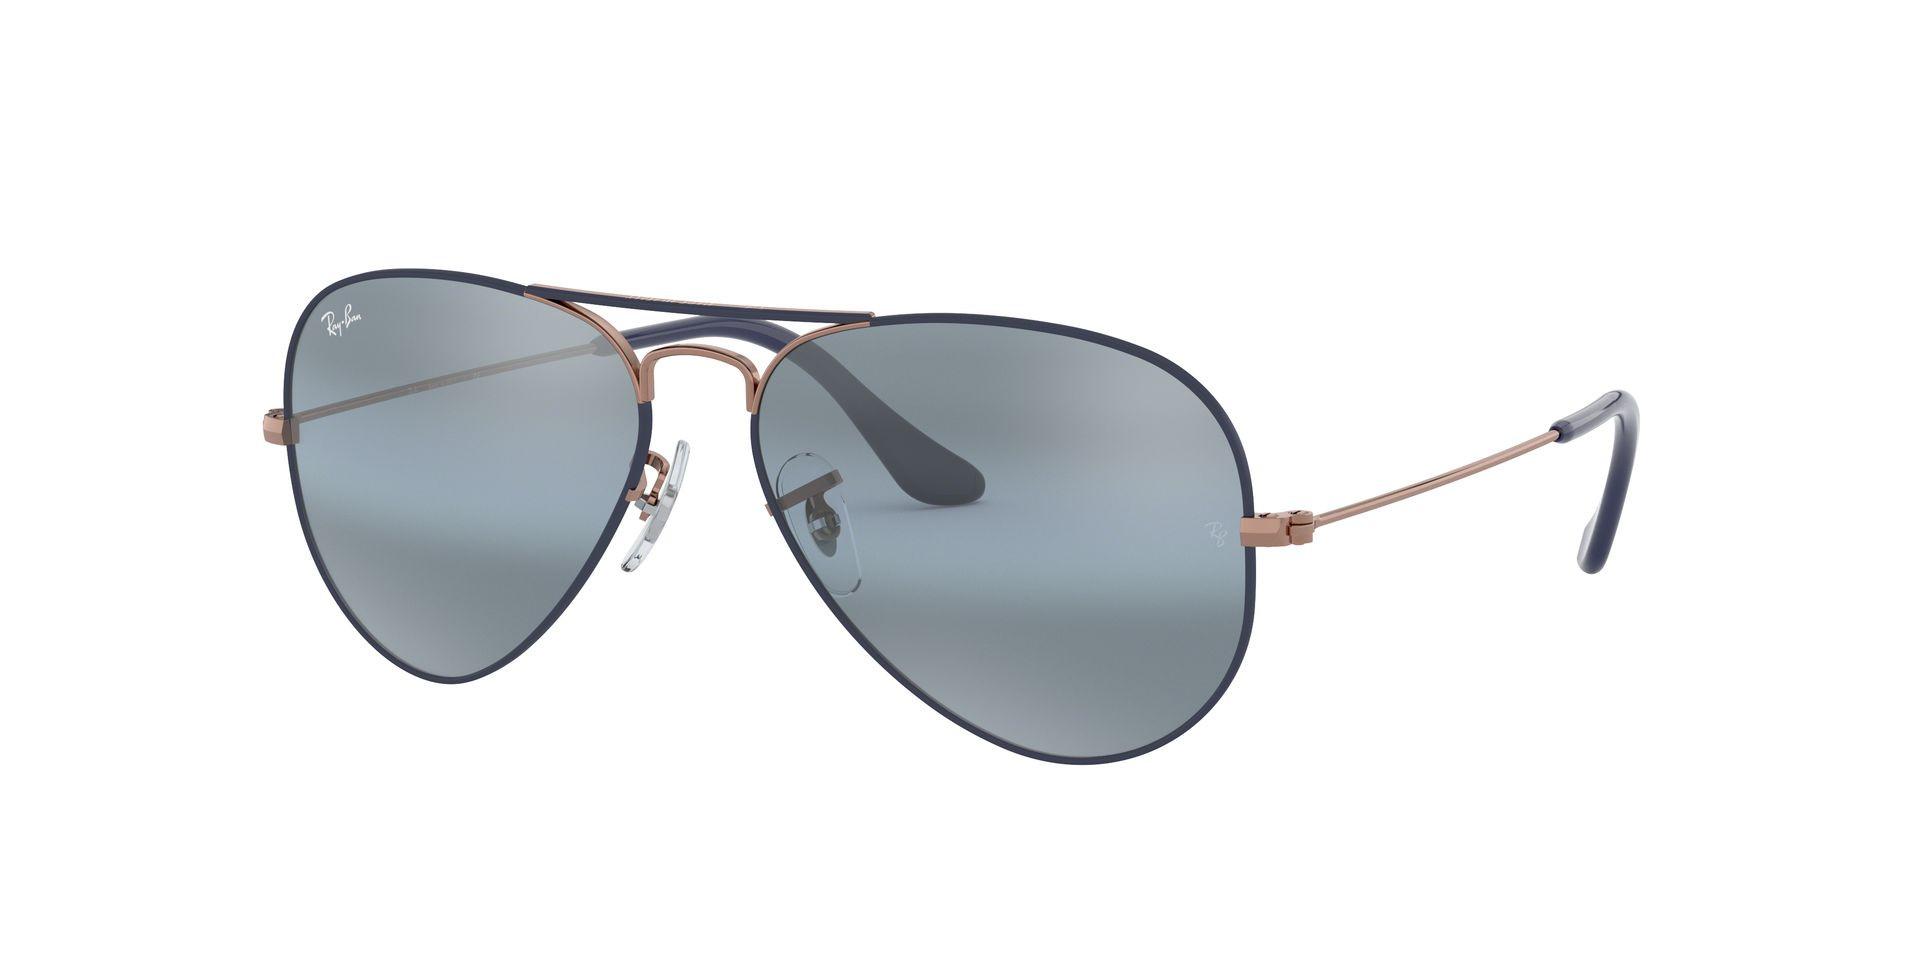 Gafas de sol RAY-BAN AVIATOR RB 3025 9156AJ